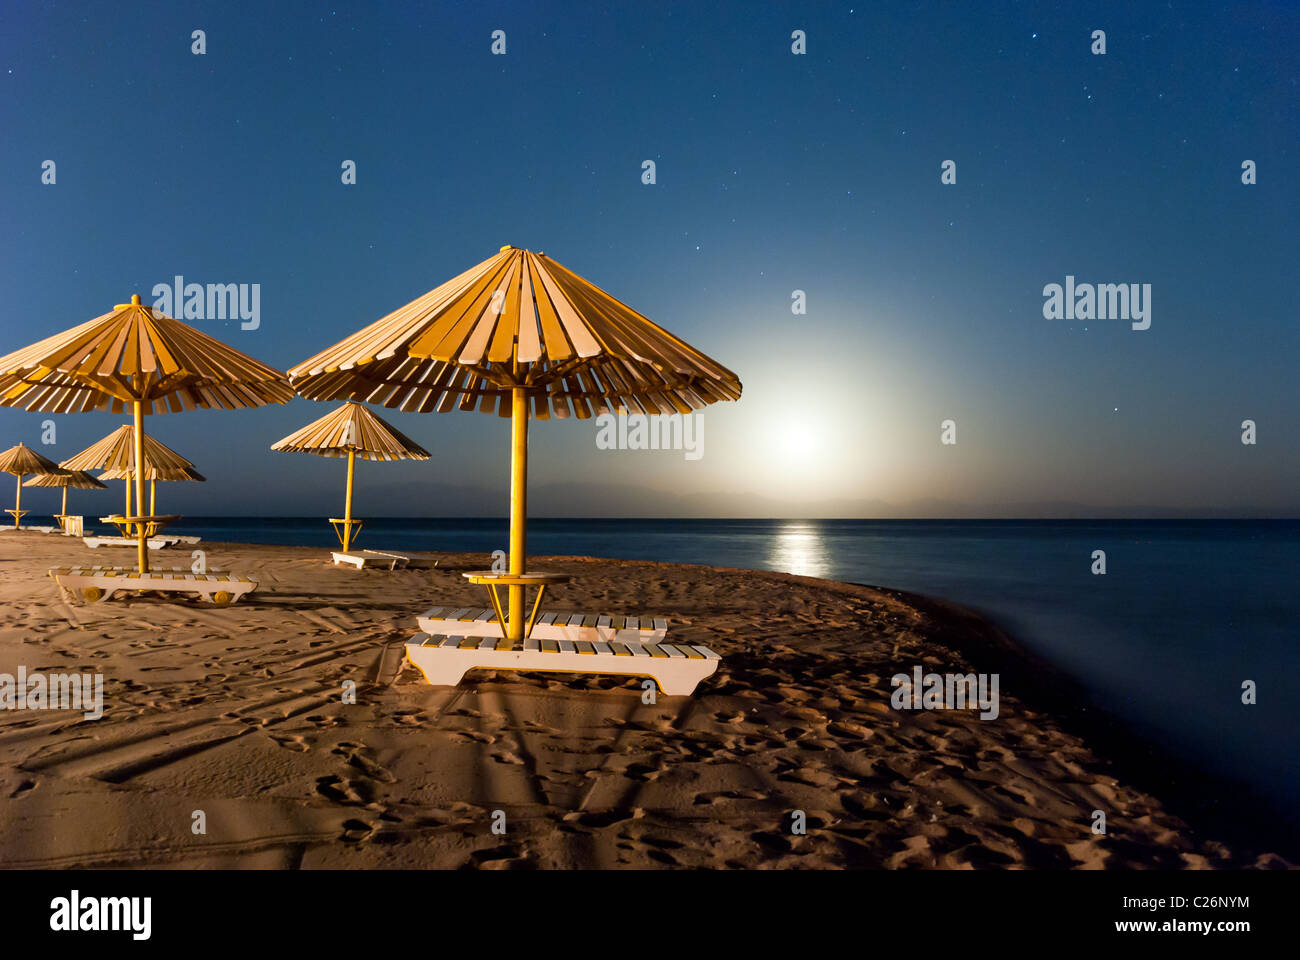 Moonshine in the gulf of Aqaba - Dahab, Sinai Peninsula, Egypt - Stock Image